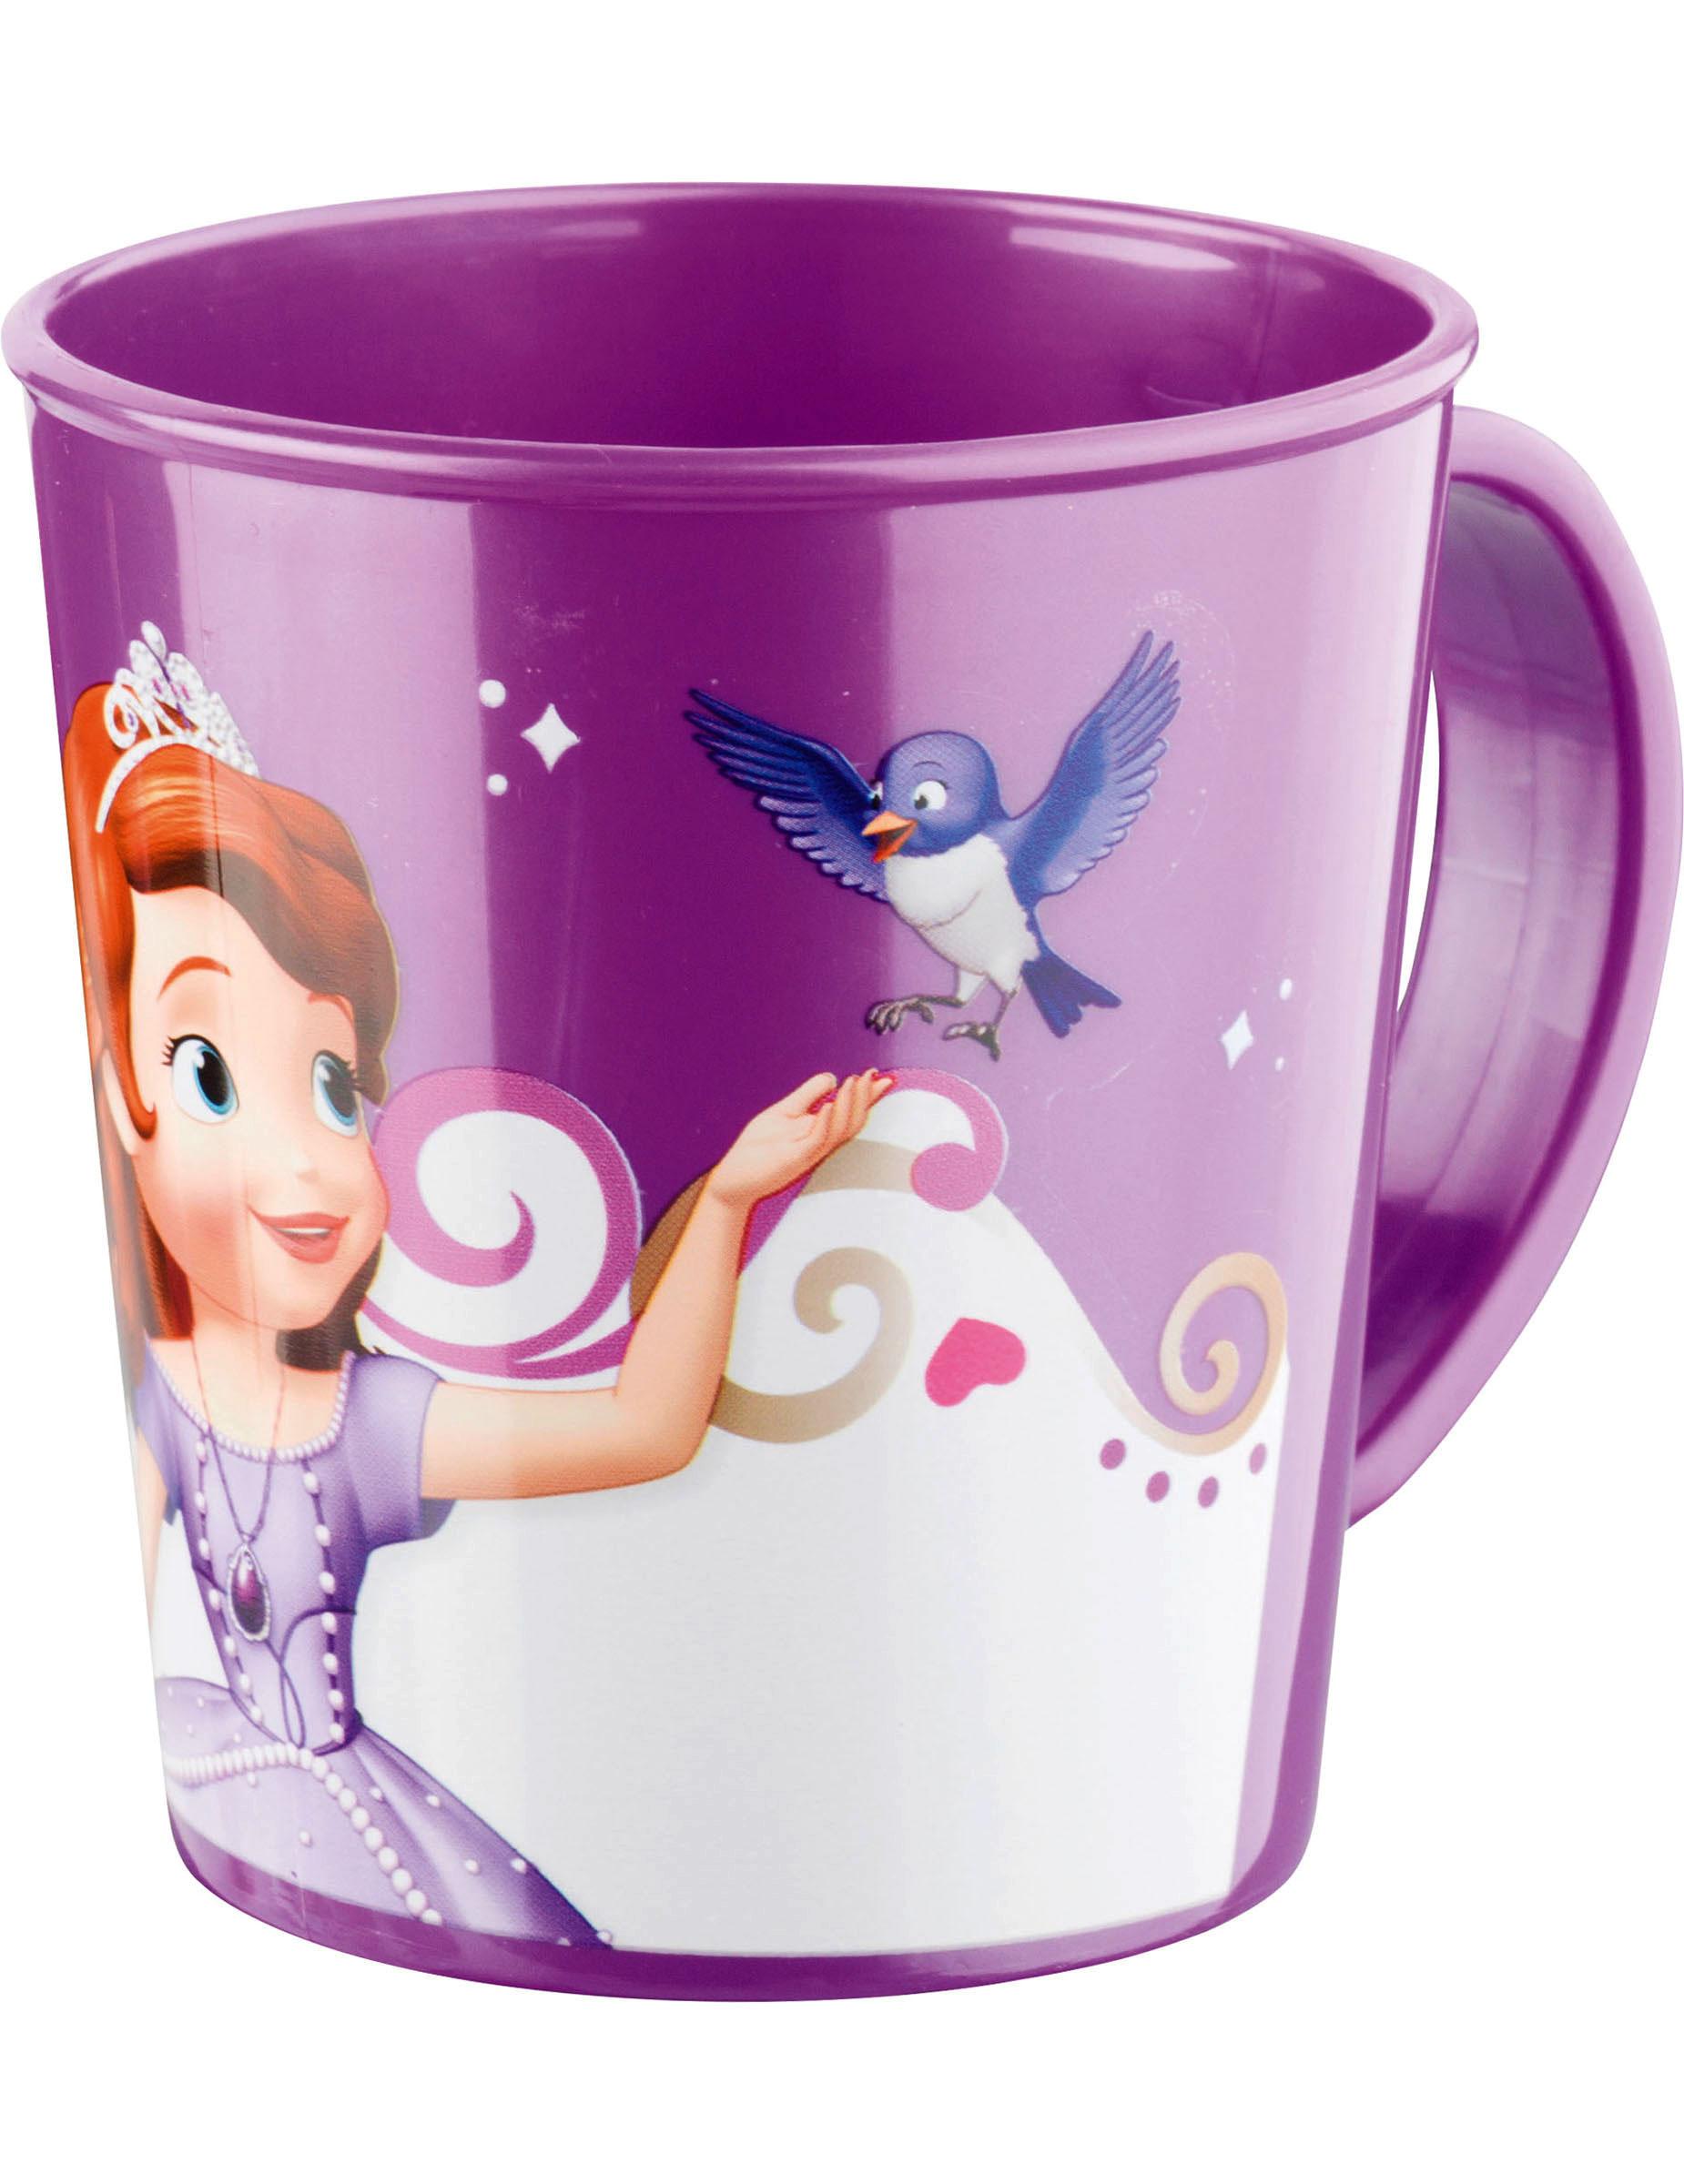 mug en plastique princesse sofia deguise toi achat de decoration animation. Black Bedroom Furniture Sets. Home Design Ideas